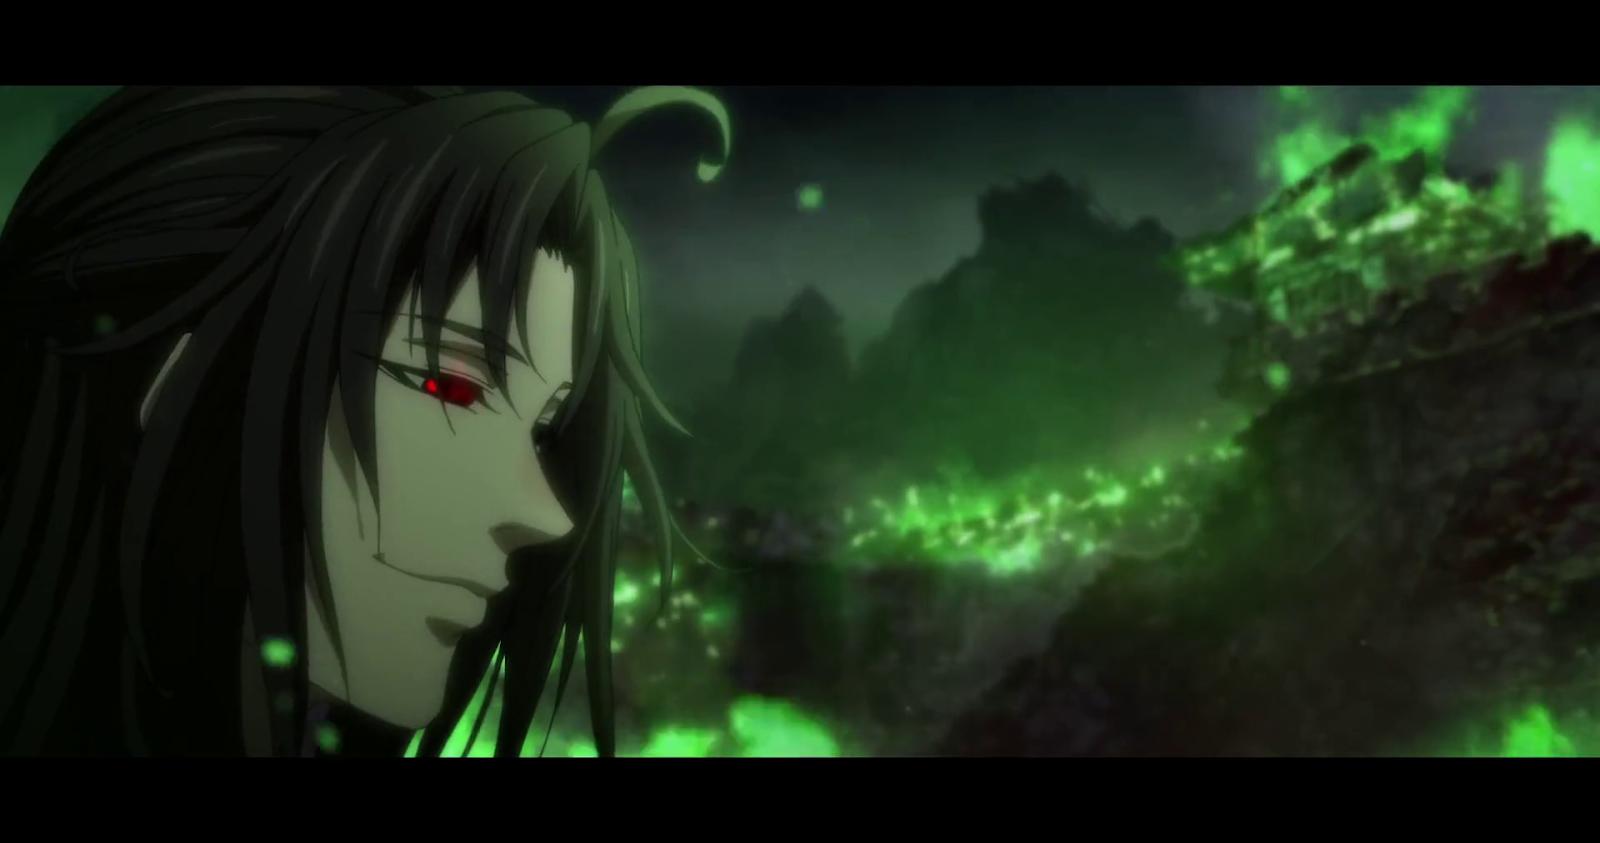 Grandmaster Of Demonic Cultivation Anime Ep 1 - #GolfClub